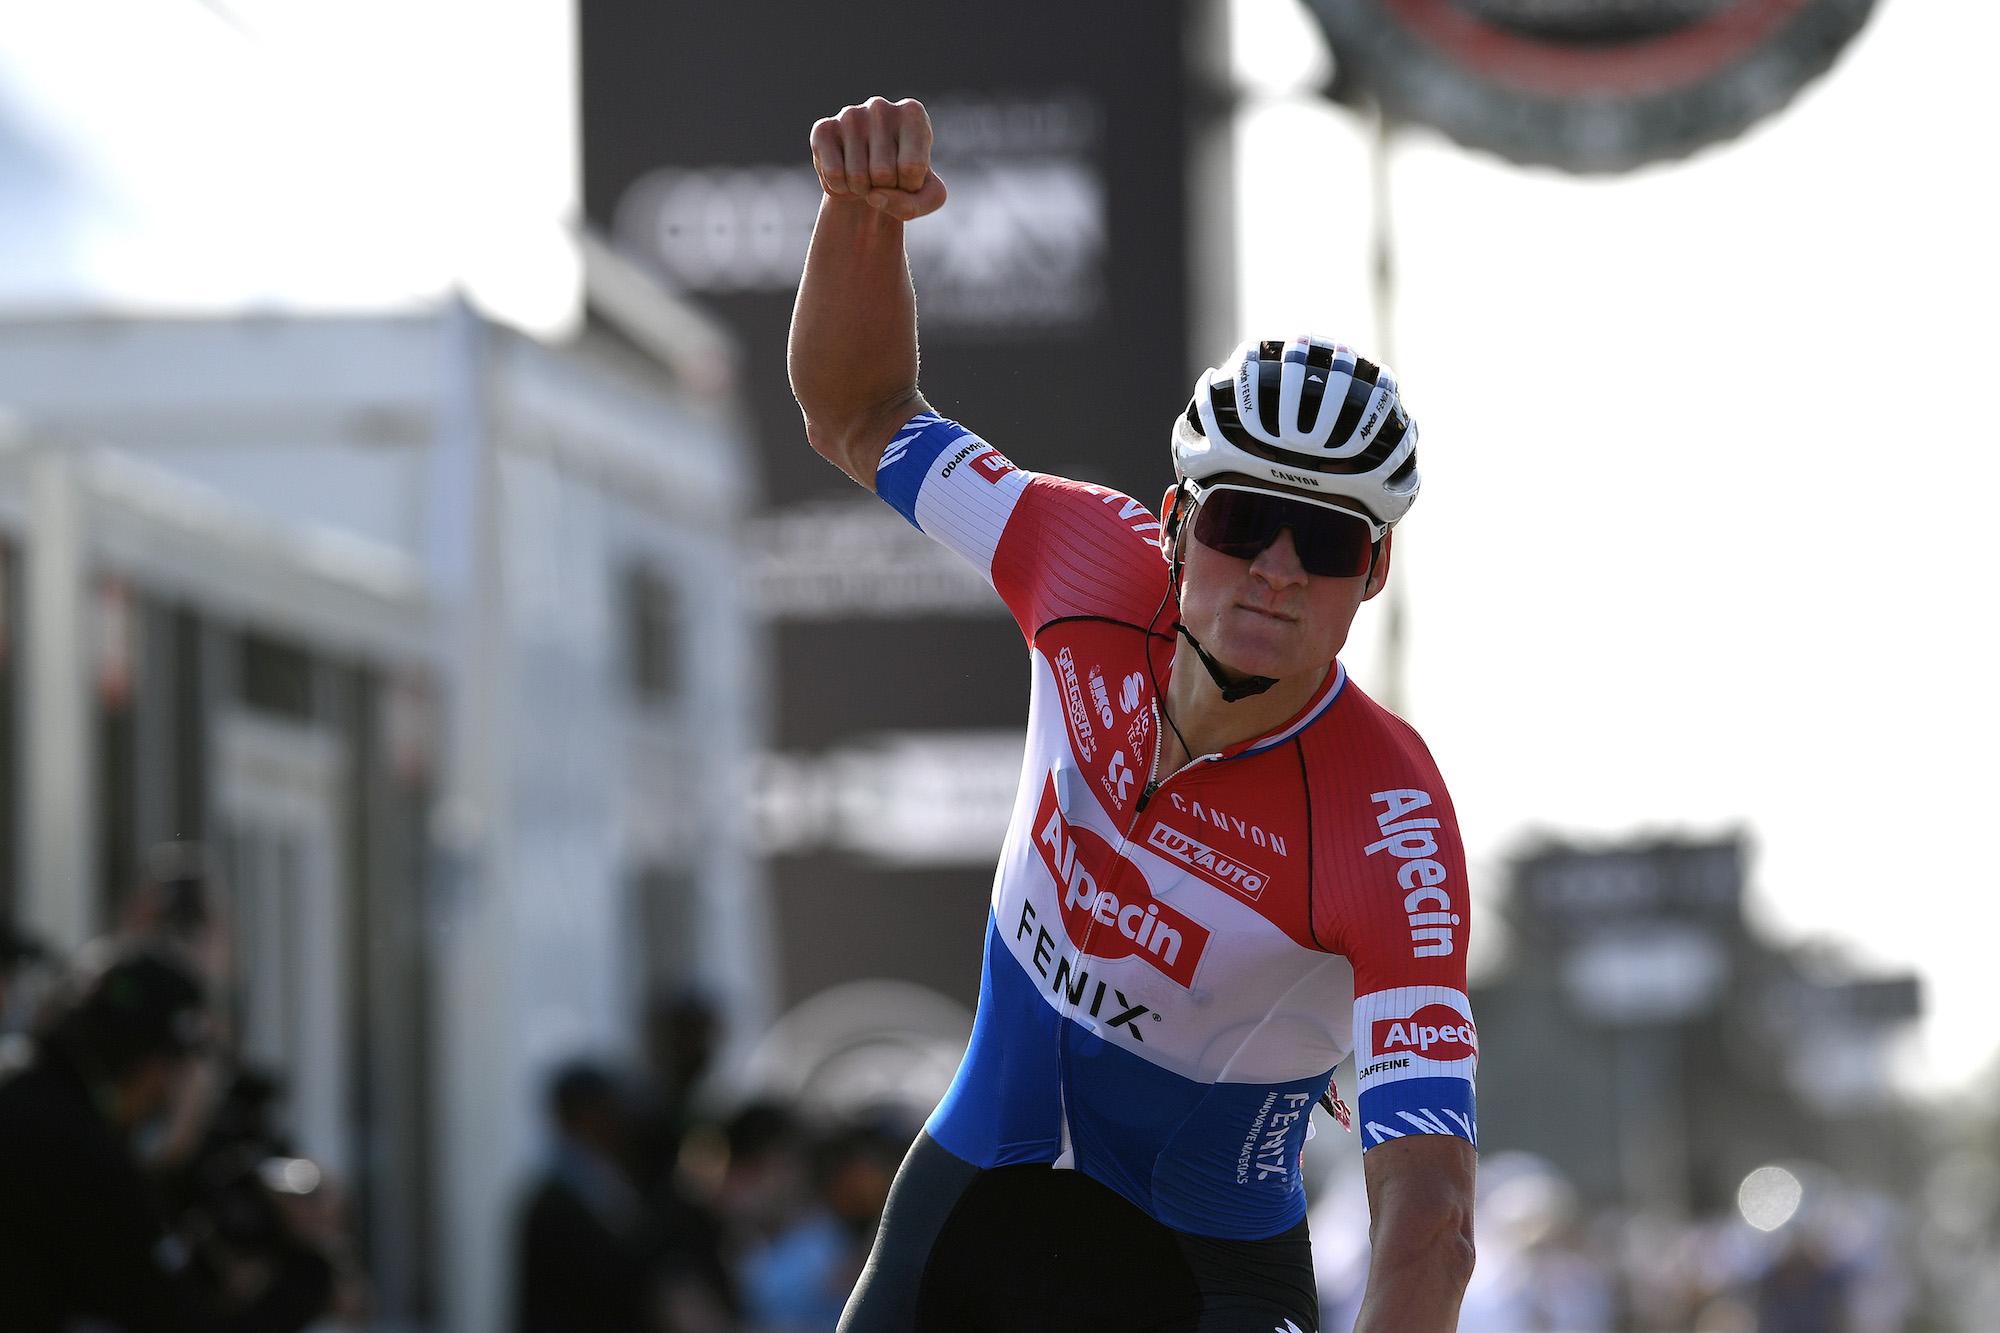 Mathieu van der Poel returns to the Netherlands after team pulls out of UAE Tour